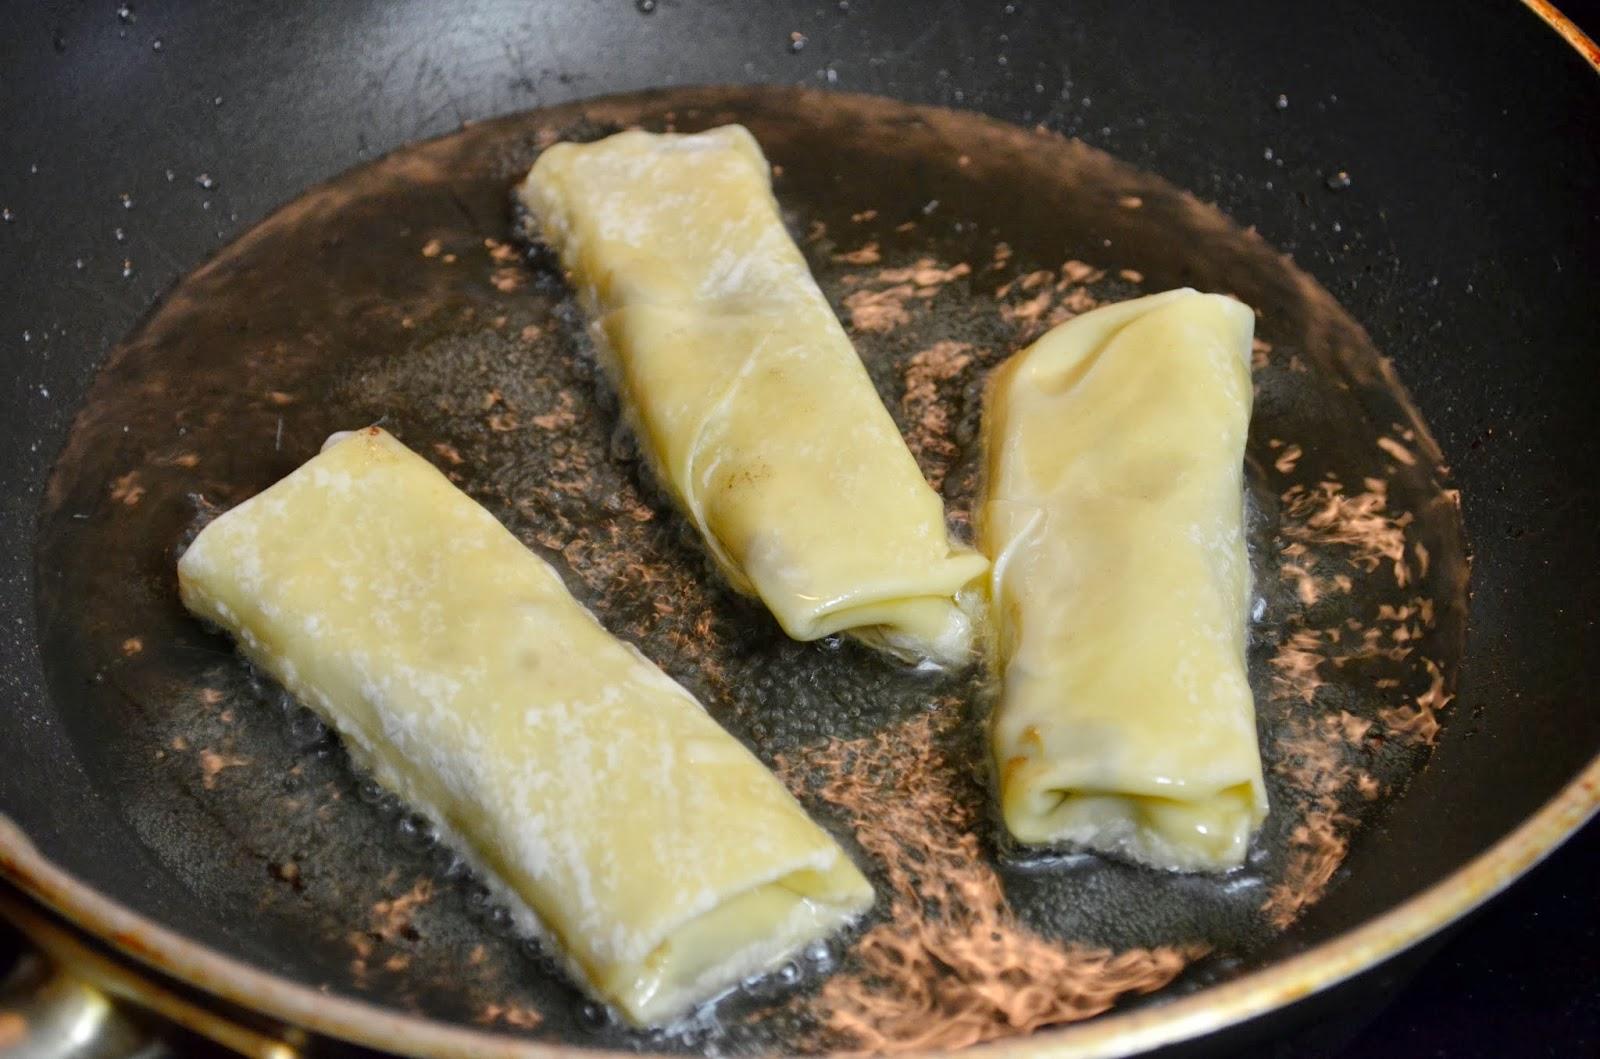 black bean spring rolls recipe, vegetarian spring rolls recipe, vegan spring rolls recipe, sweet chili dipping sauce recipe, black bean vegetarian spring rolls recipe, healthy spring rolls recipe, healthy vegetarian recipe